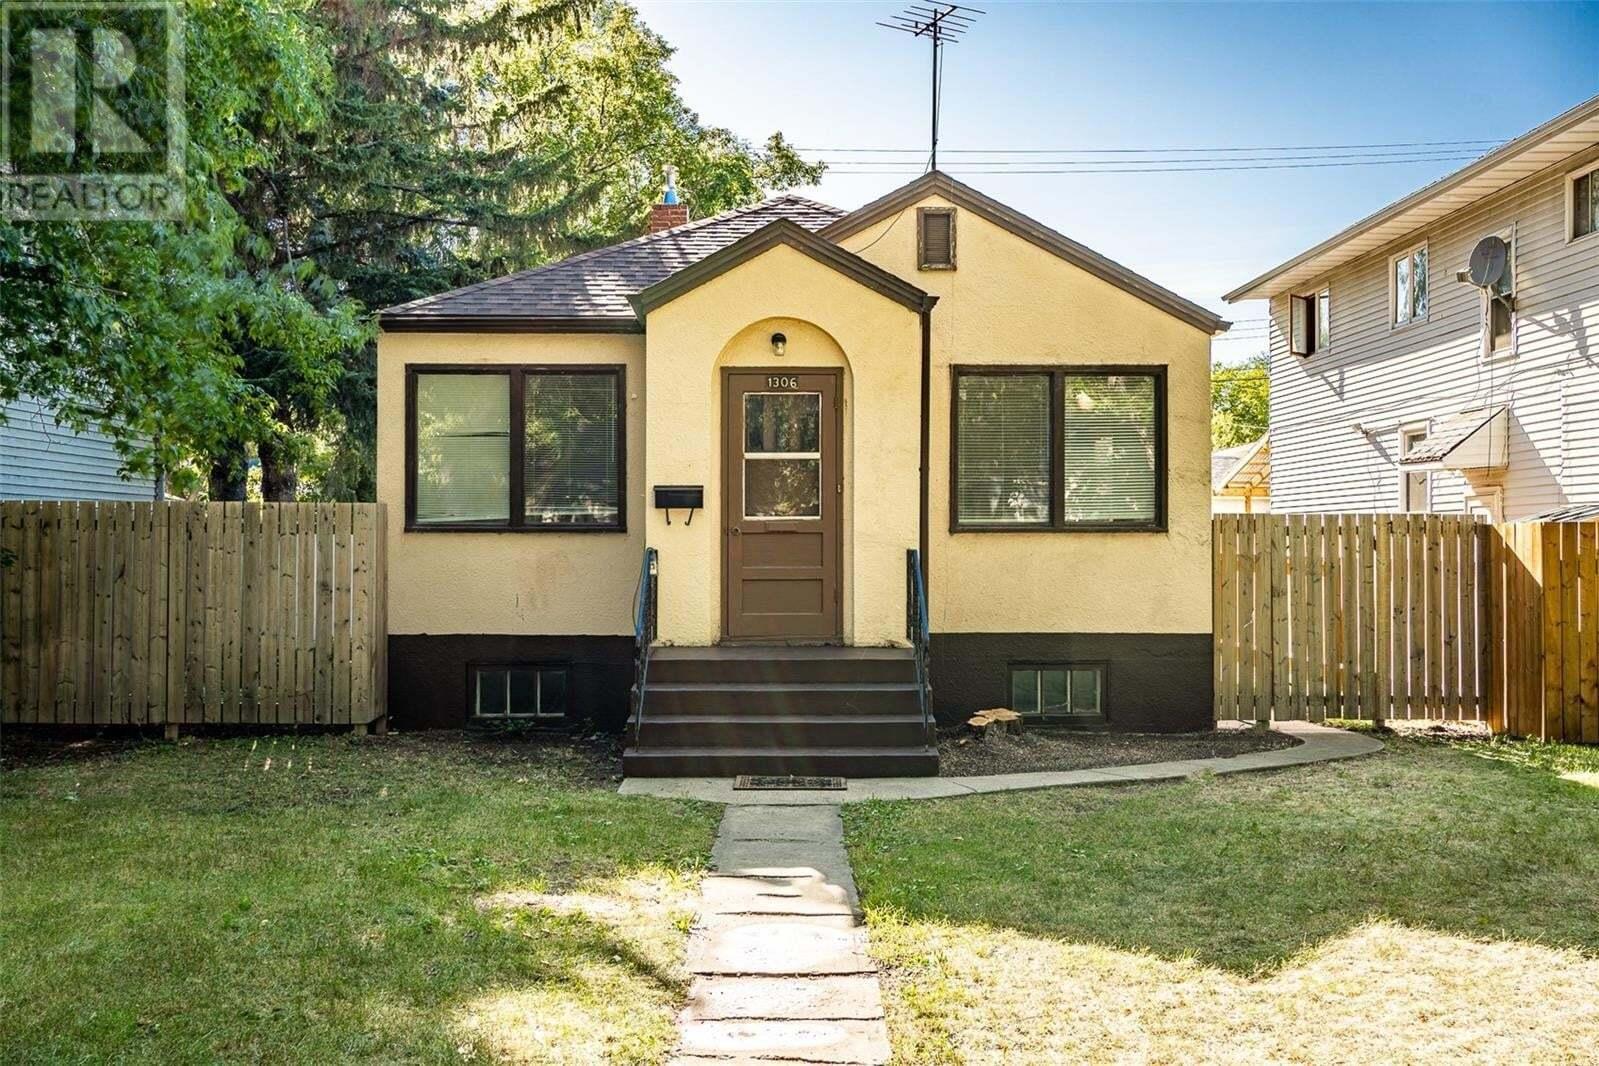 House for sale at 1306 Cairns Ave Saskatoon Saskatchewan - MLS: SK819725